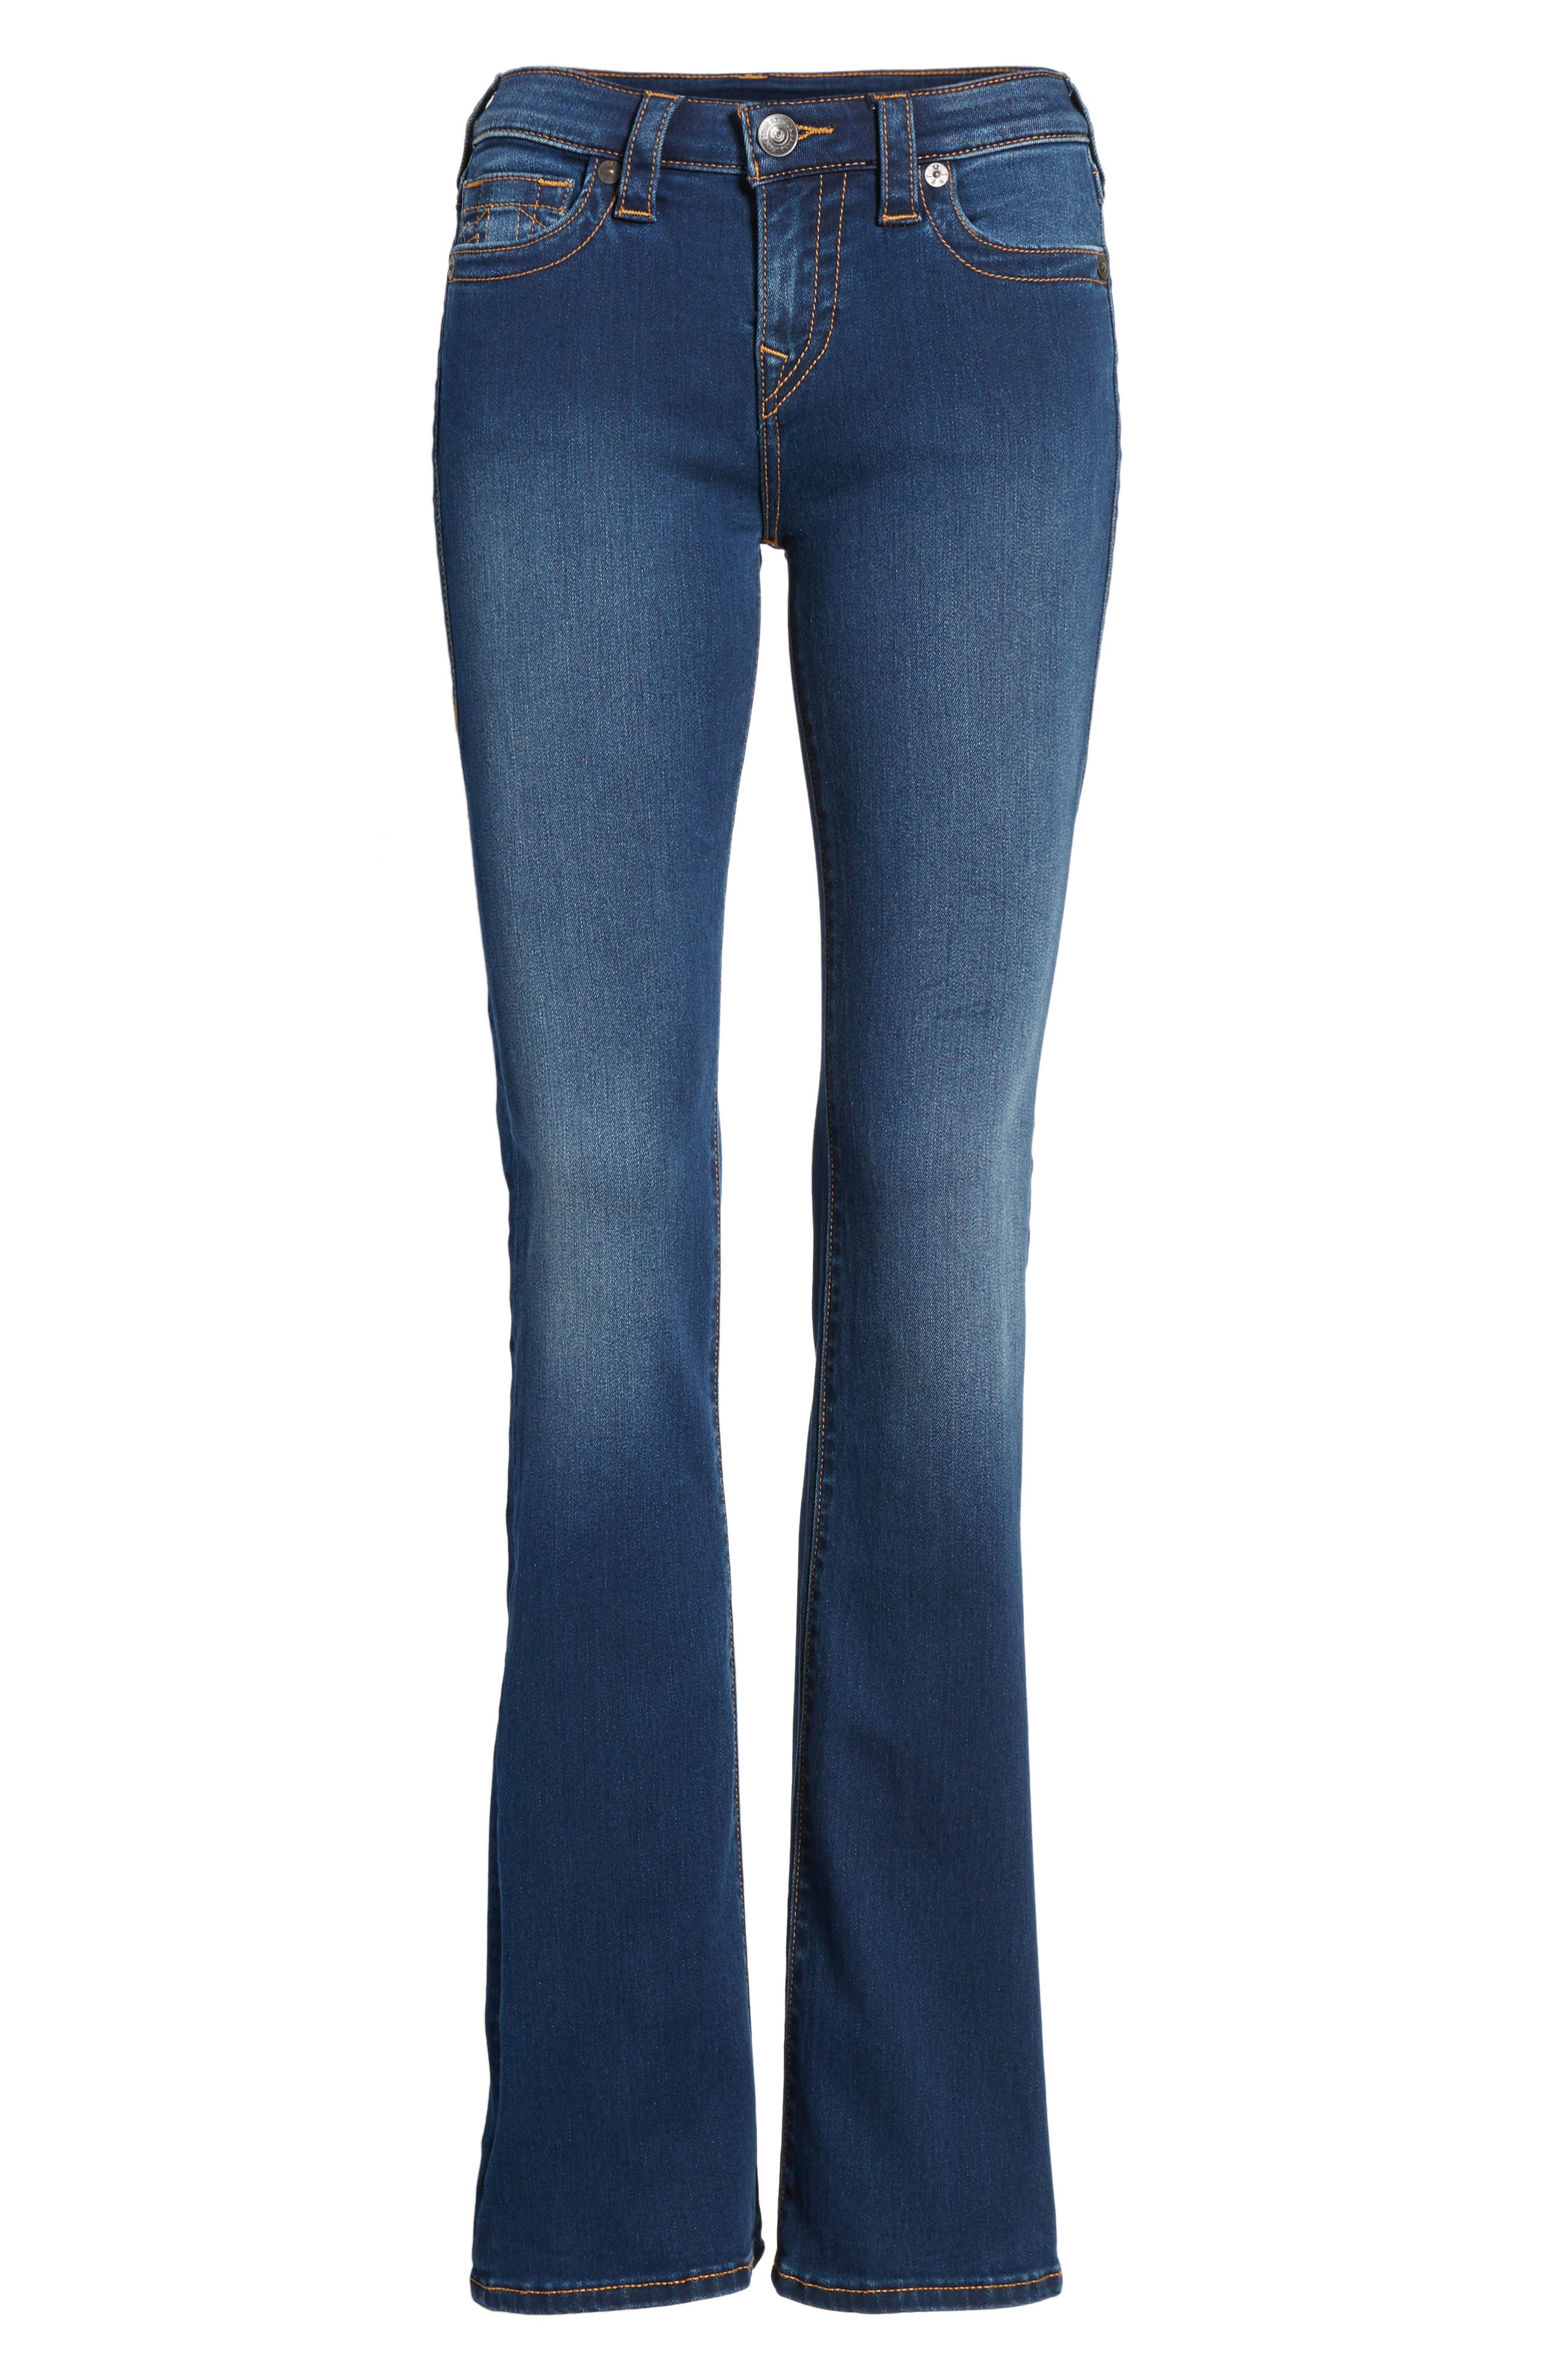 Becca Bootcut Jeans,                             Alternate thumbnail 6, color,                             Lands End Indigo